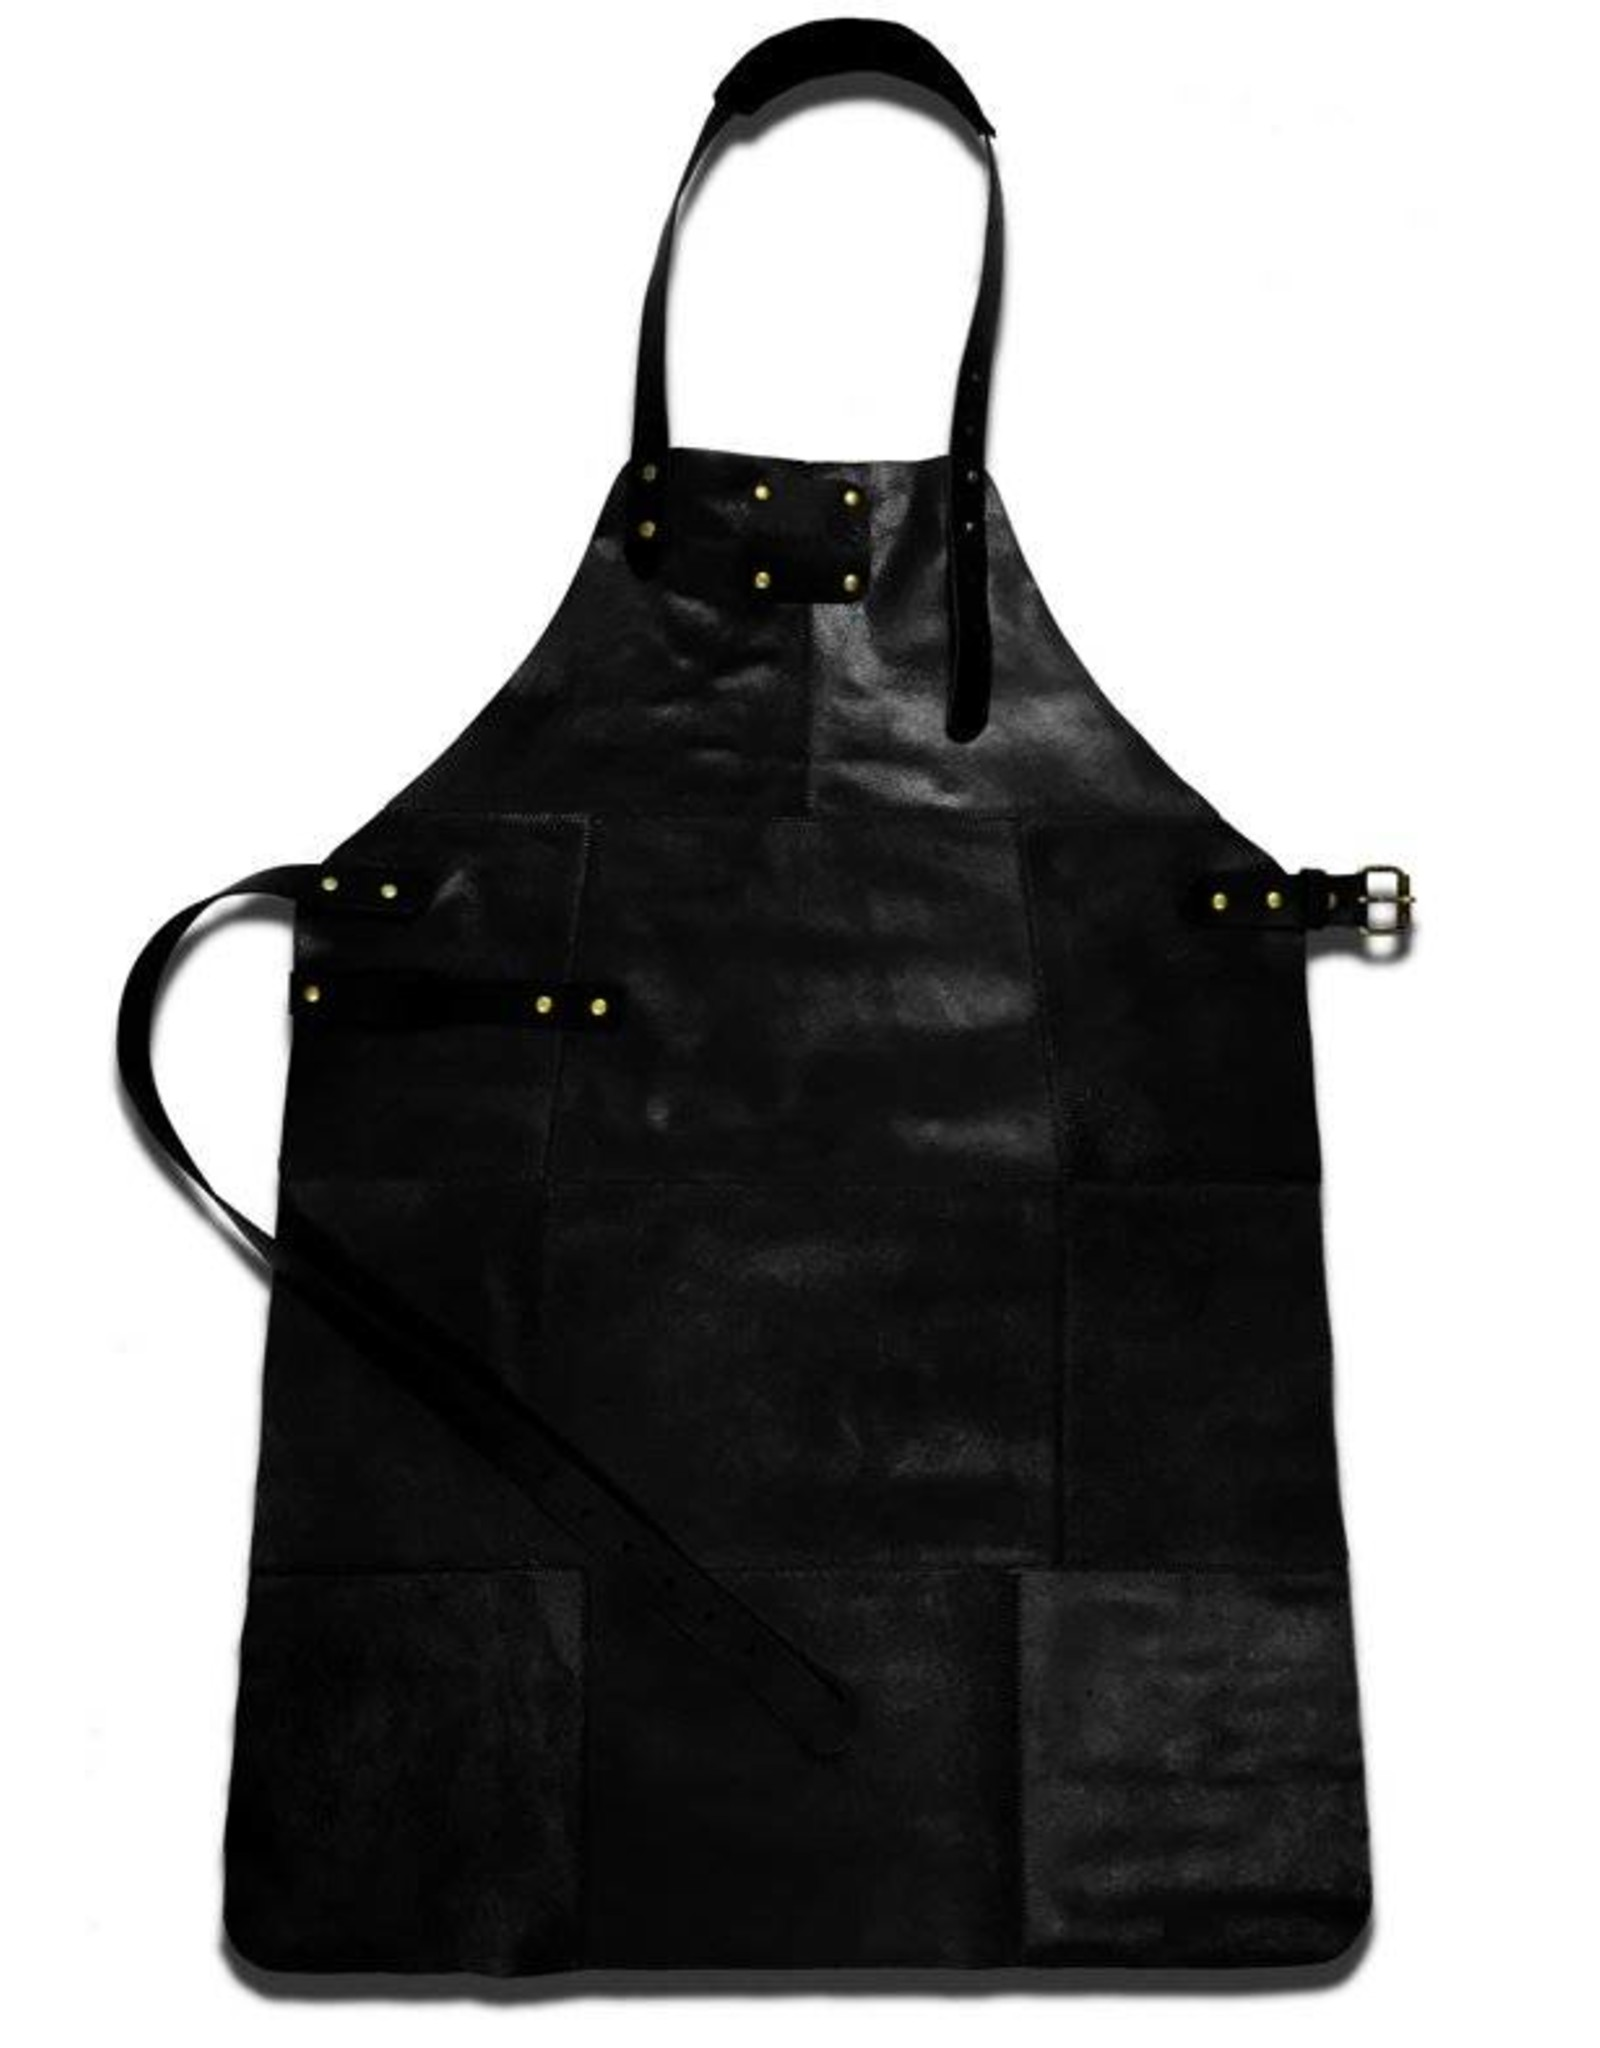 Parya Home Parya Home - Lederen Barbecue Schort - Zwart